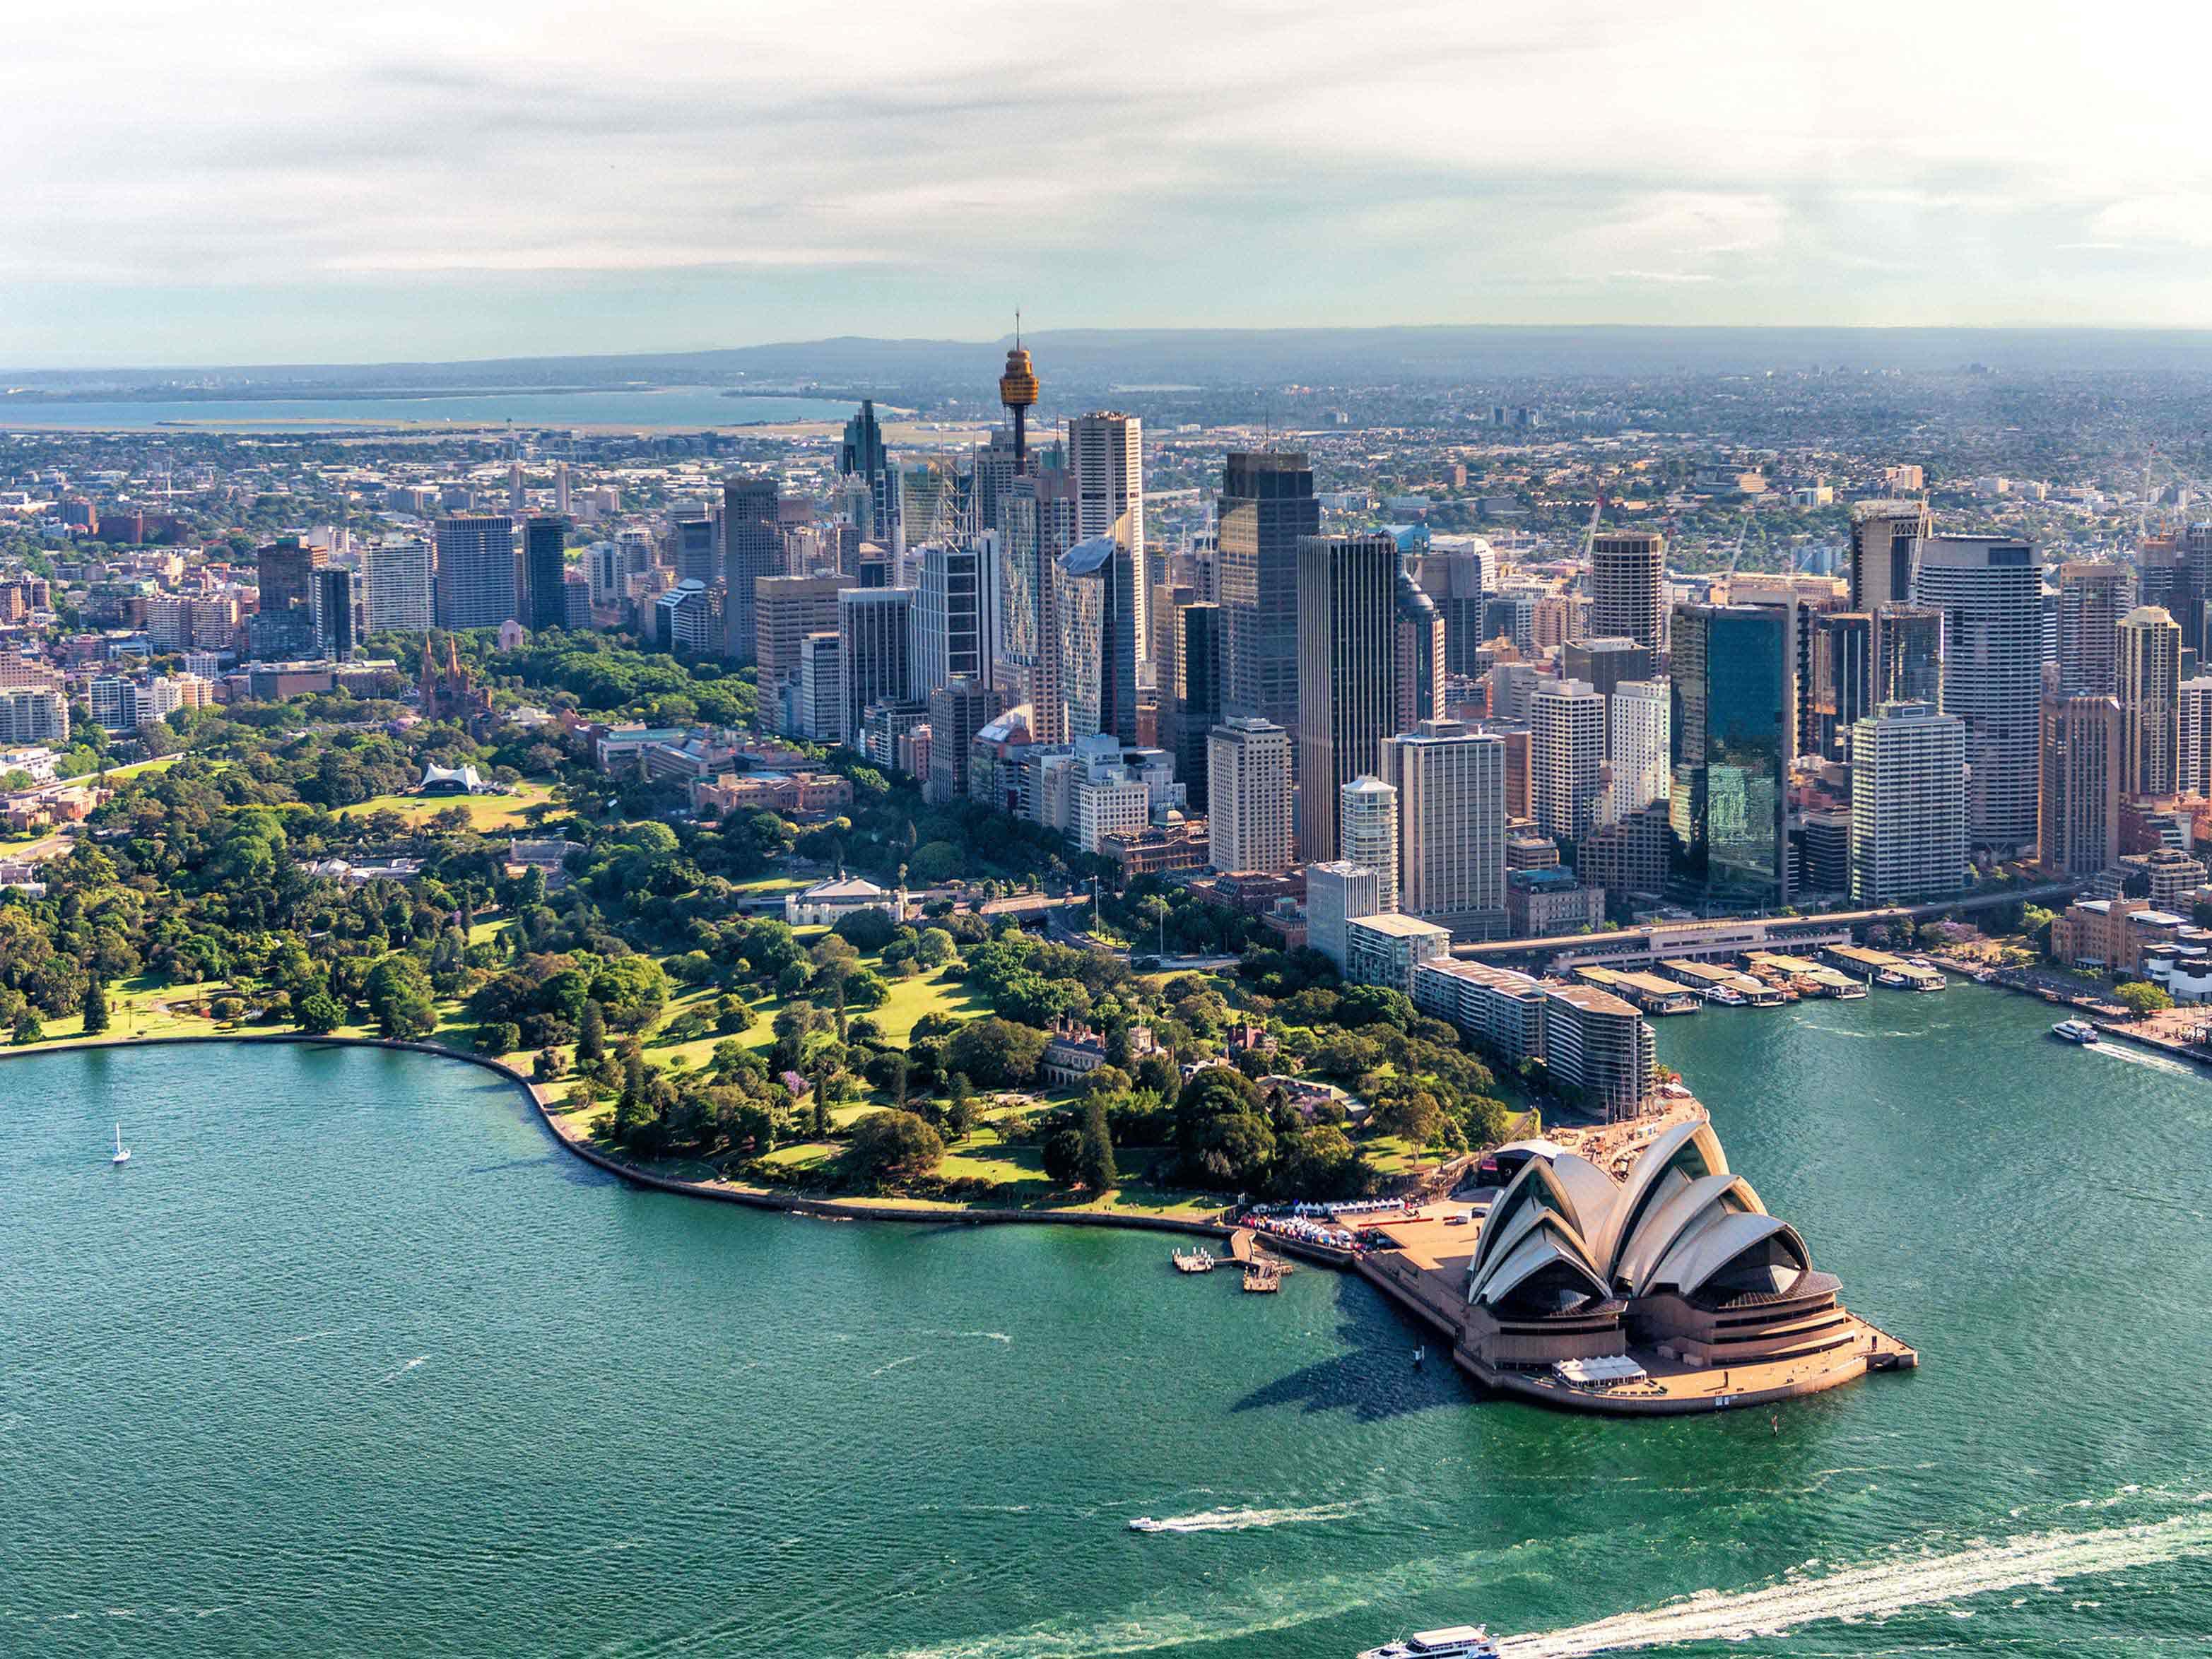 Road to net-zero by 2035: Energy targets in Sydney's new developments